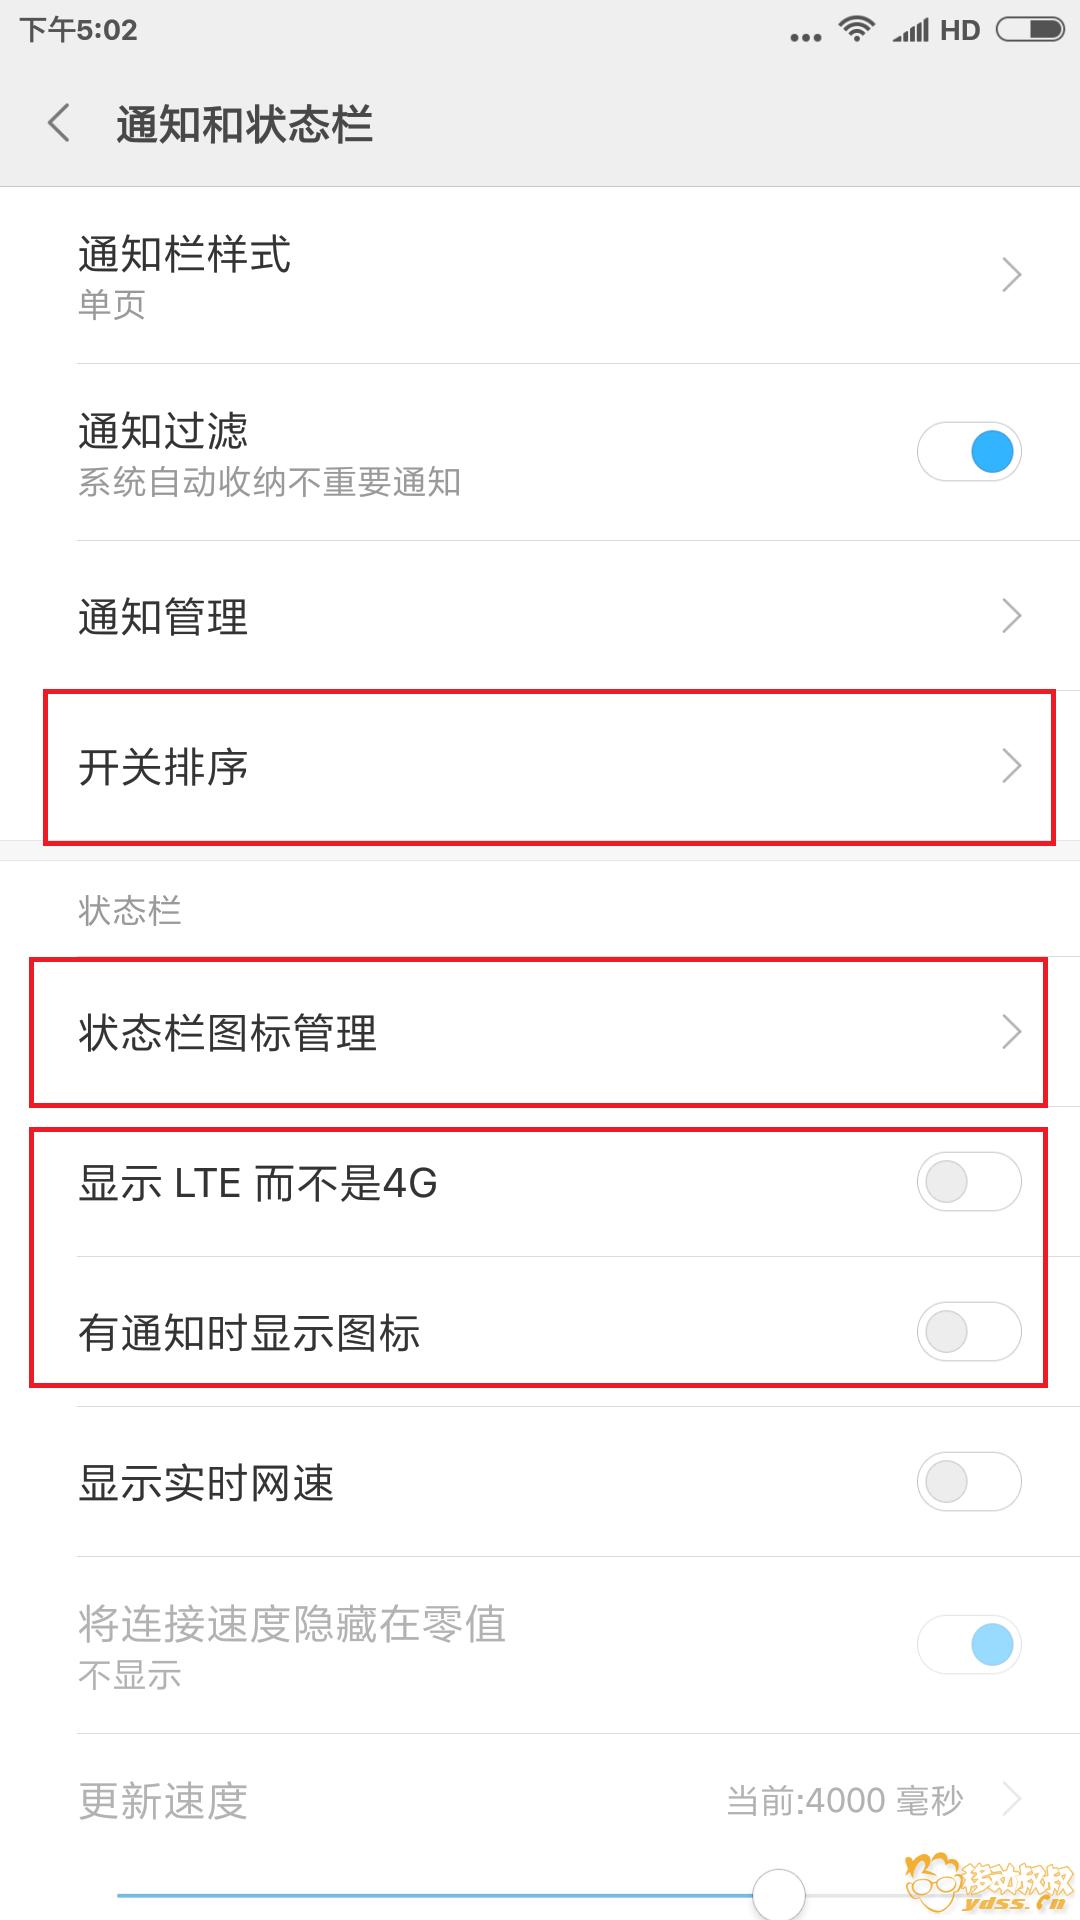 Screenshot_2018-05-19-17-02-14-229_com.android.settings.png